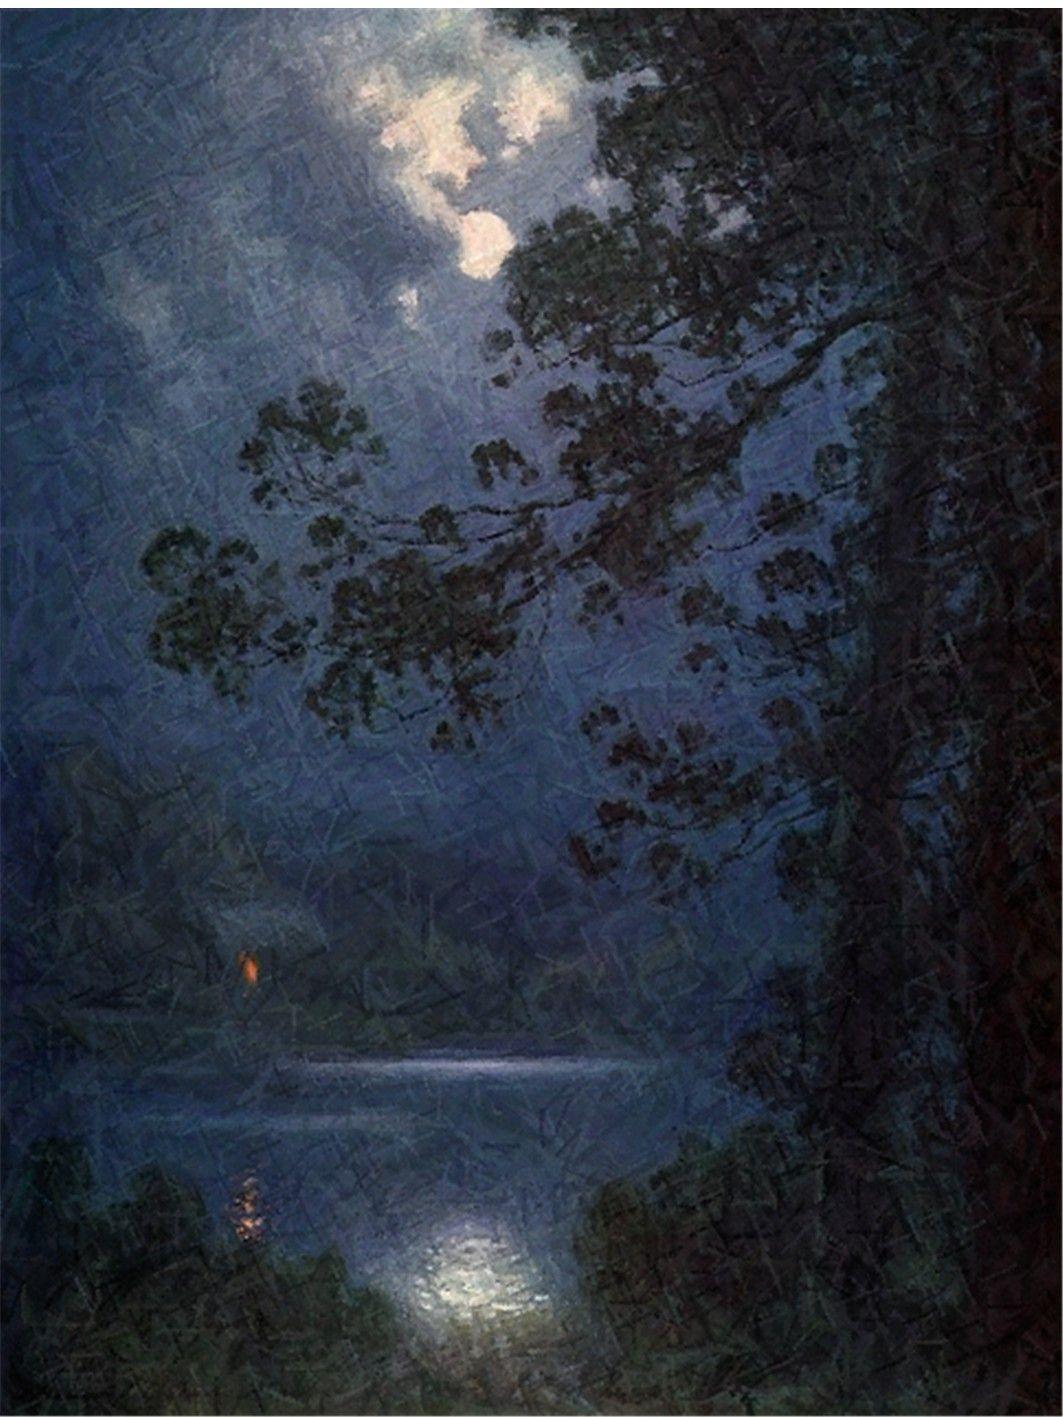 Tania K Moonlight On The Brandywine River Moonlight Painting Night Sky Painting Landscape Paintings